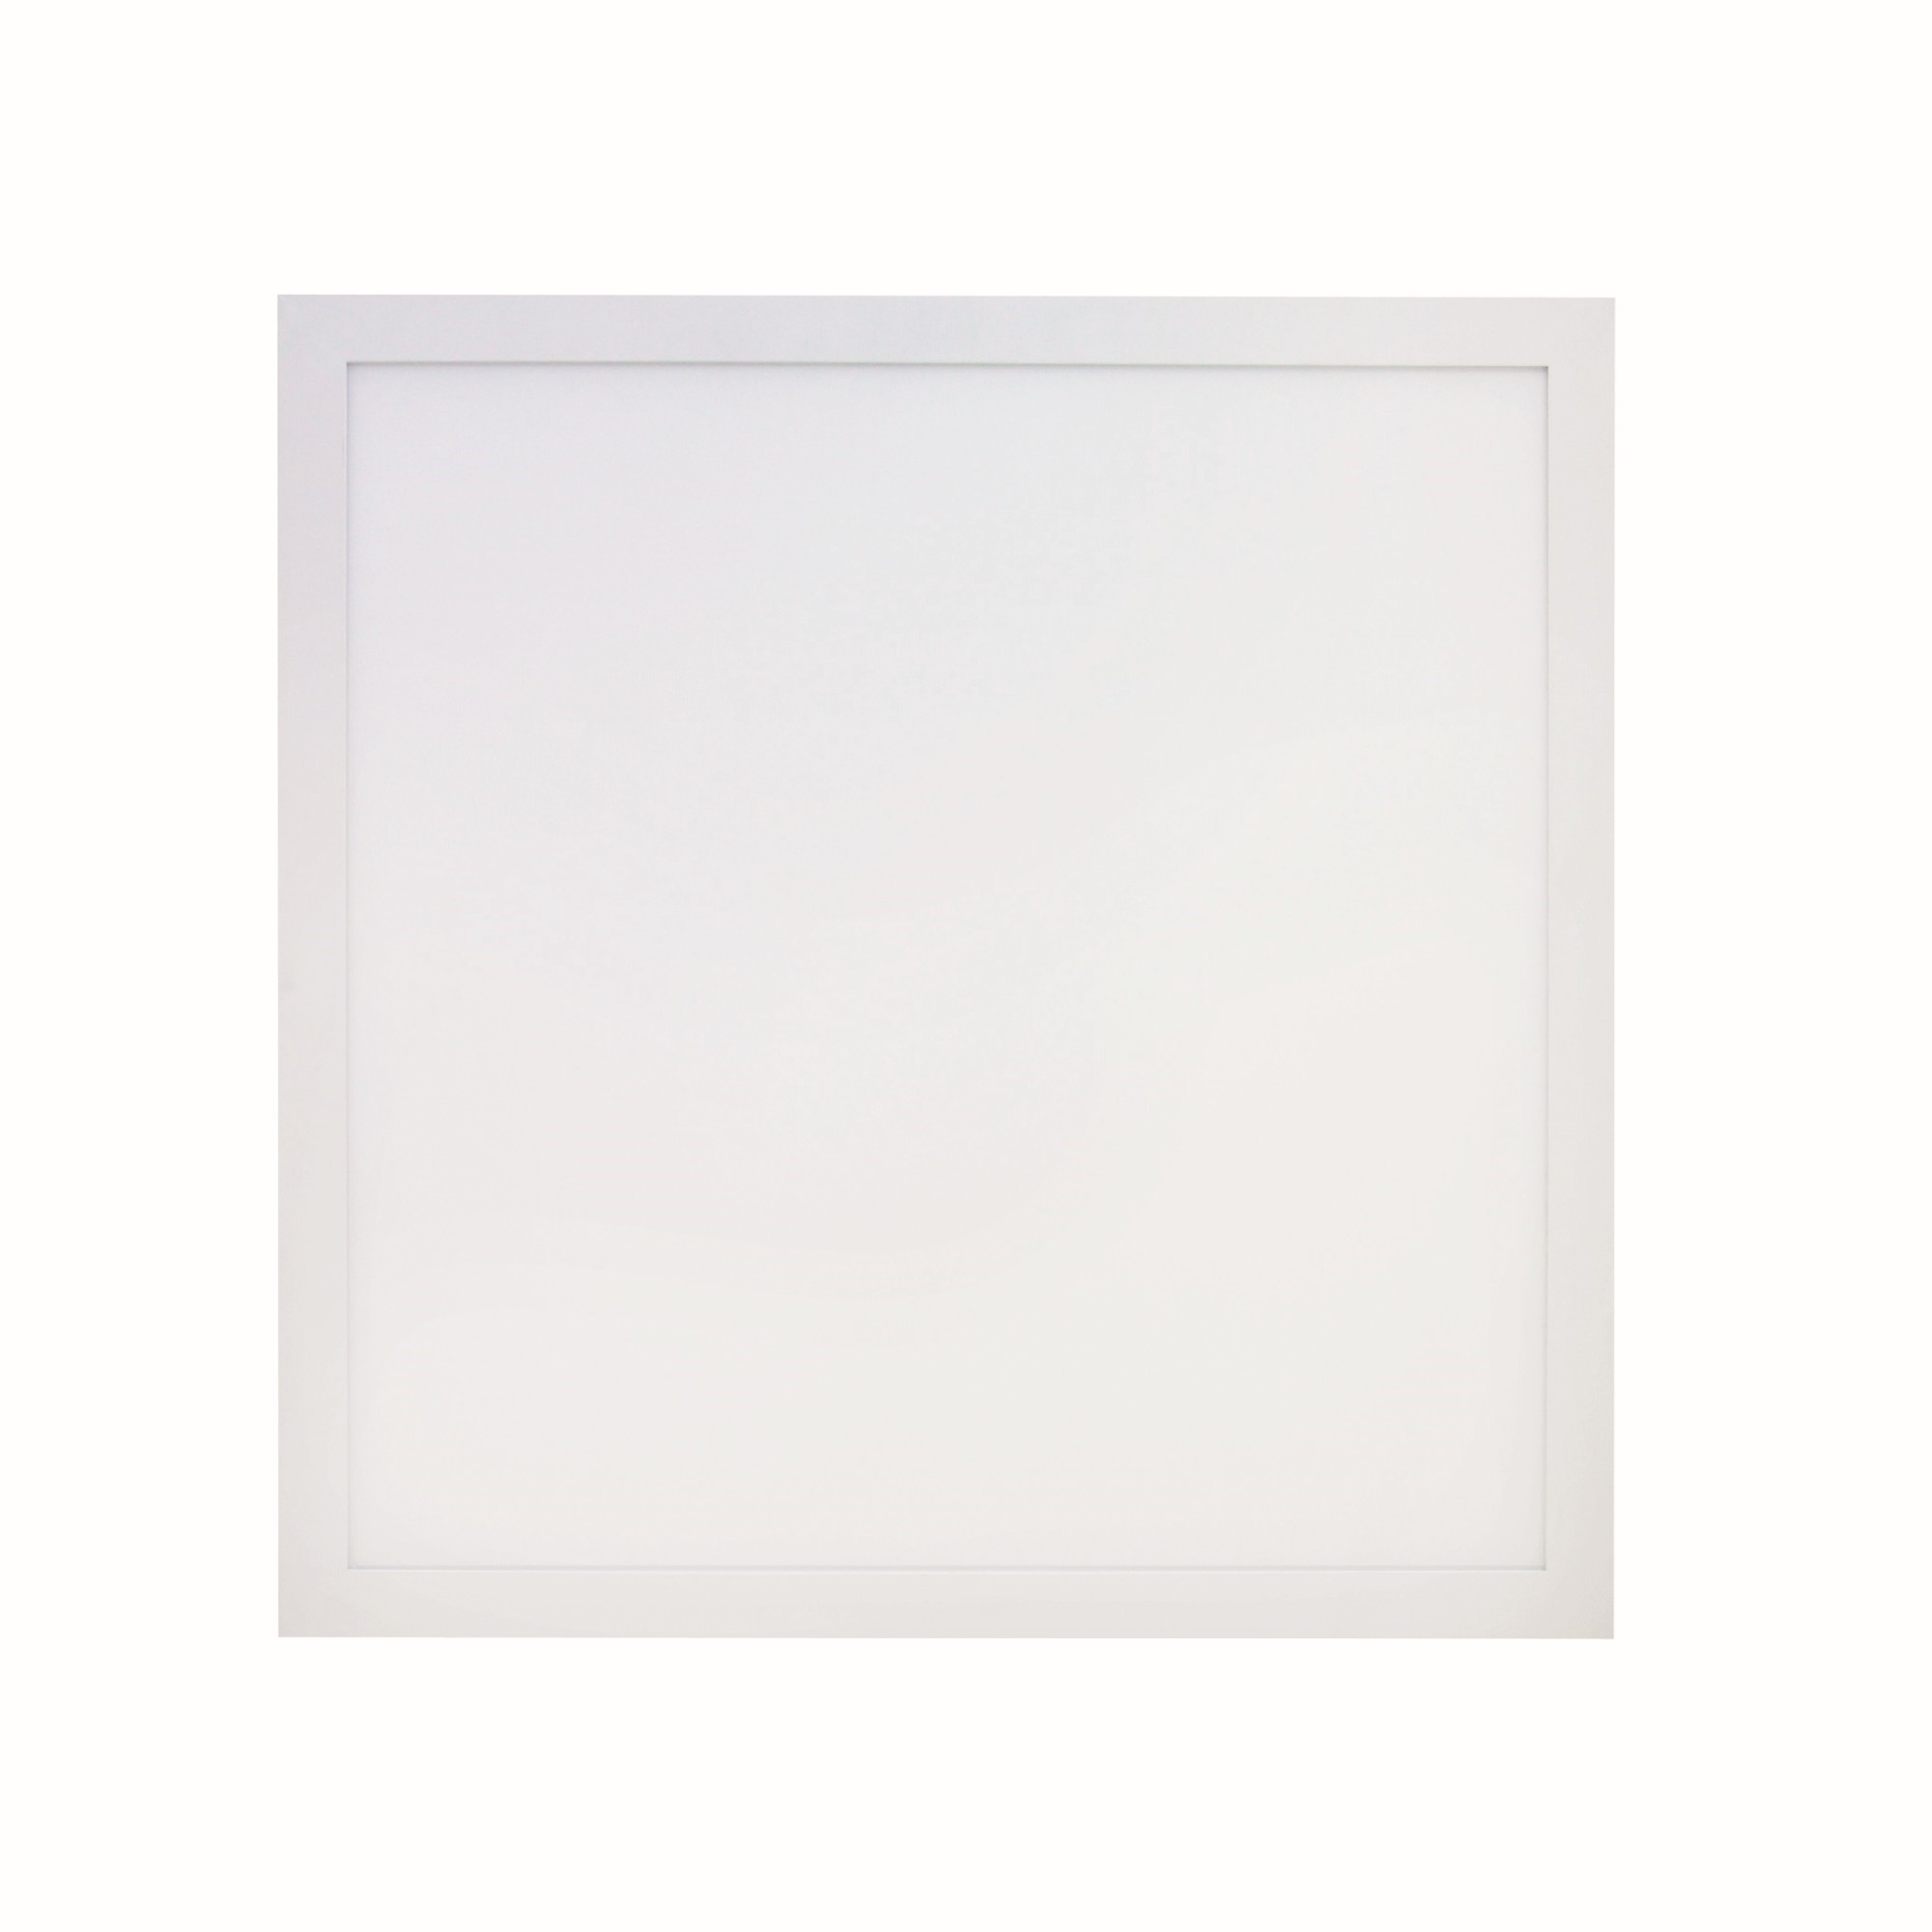 Painel LED Quadrado 50W Luz Branca Fria 62x62cm - Llum